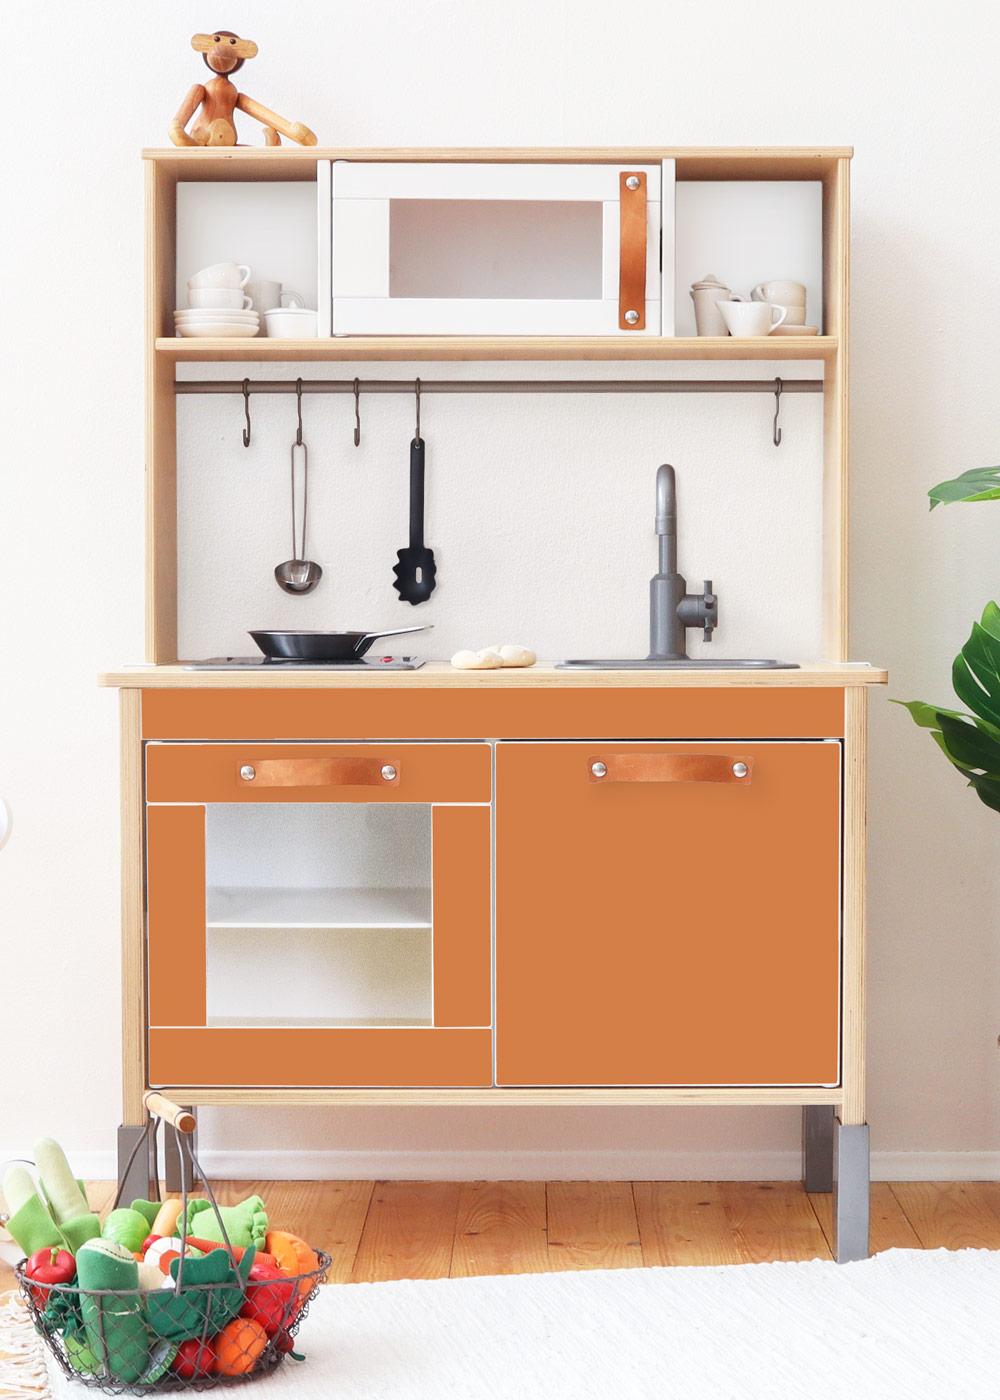 Ikea Duktig Kinderküche Frontli Kürbis Frontansicht